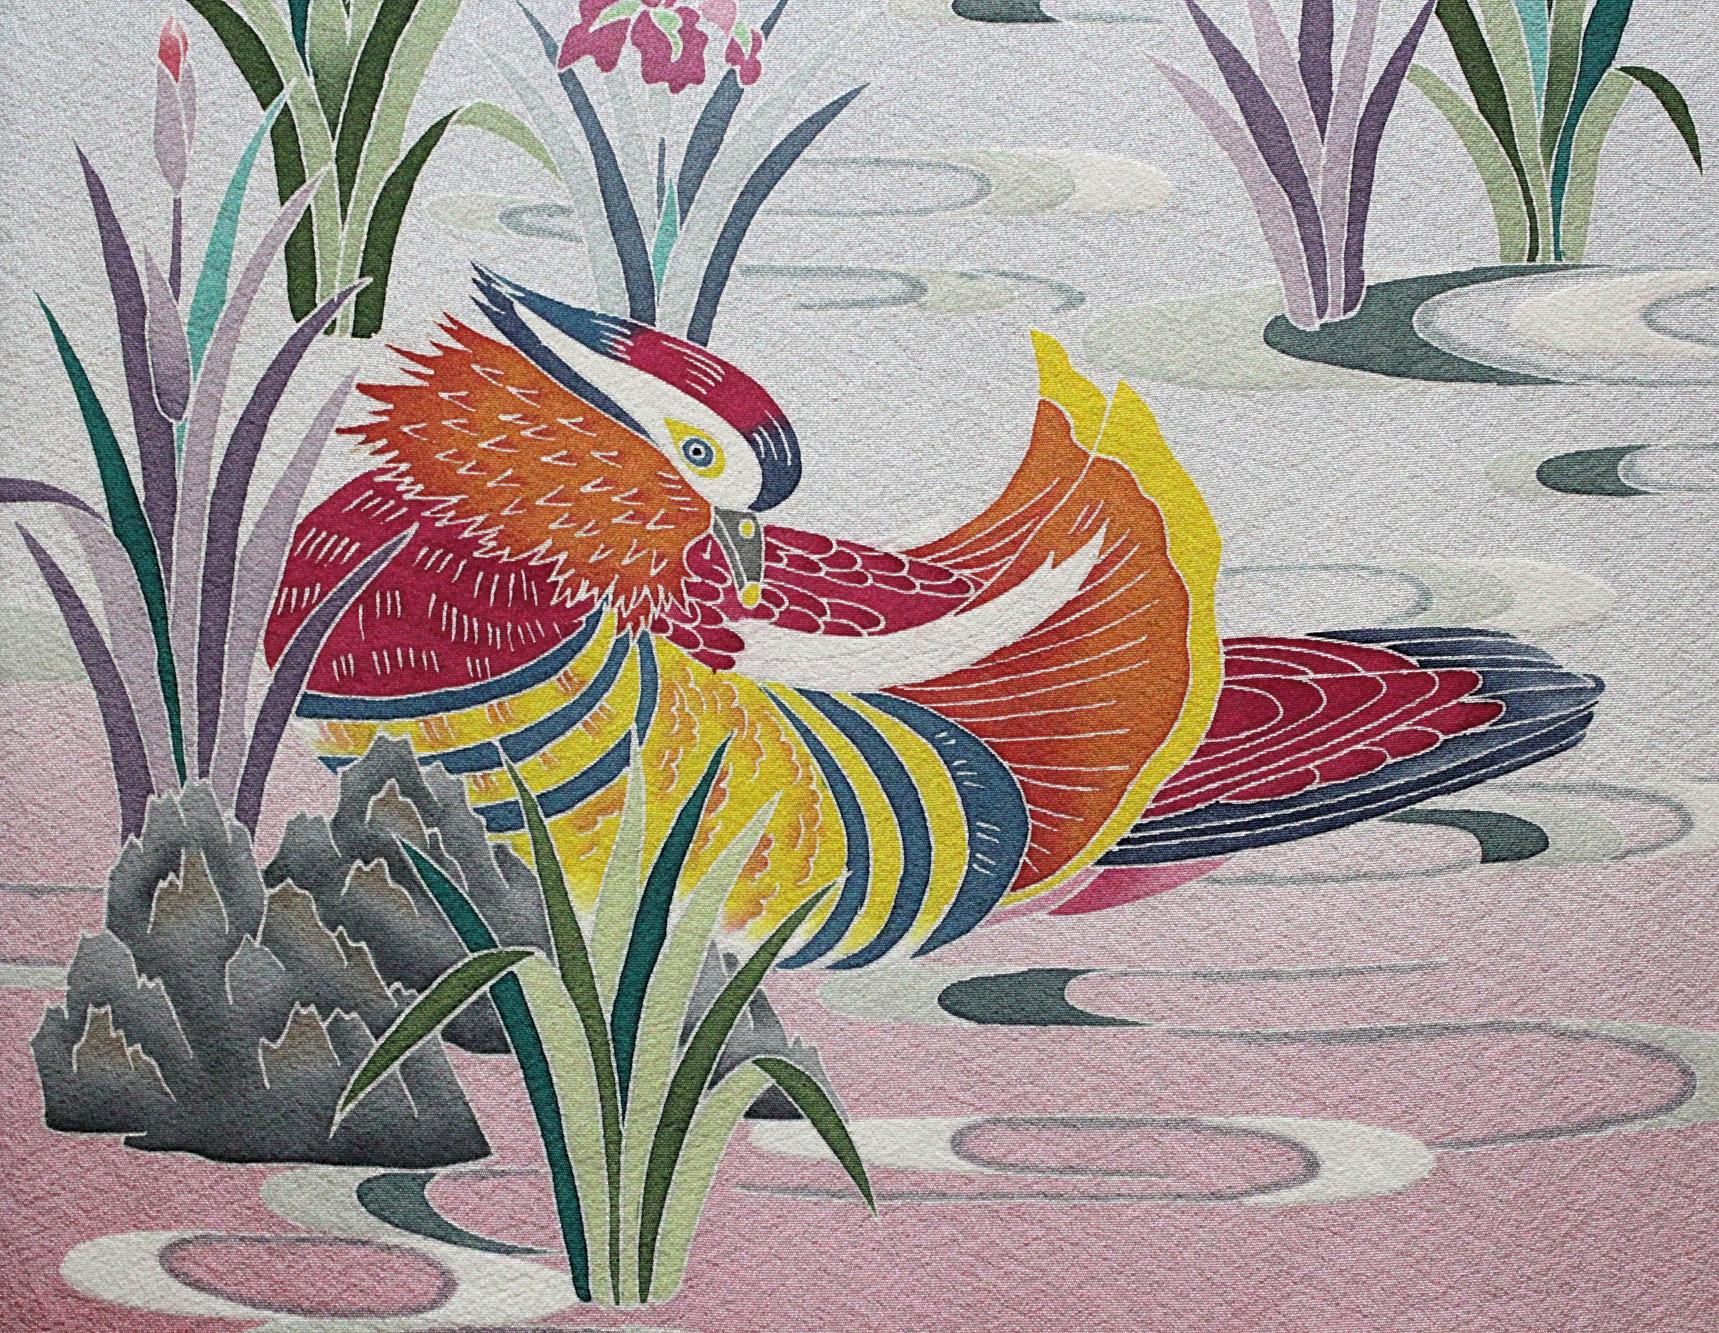 Kaga-yuzen silk painting of a male duck